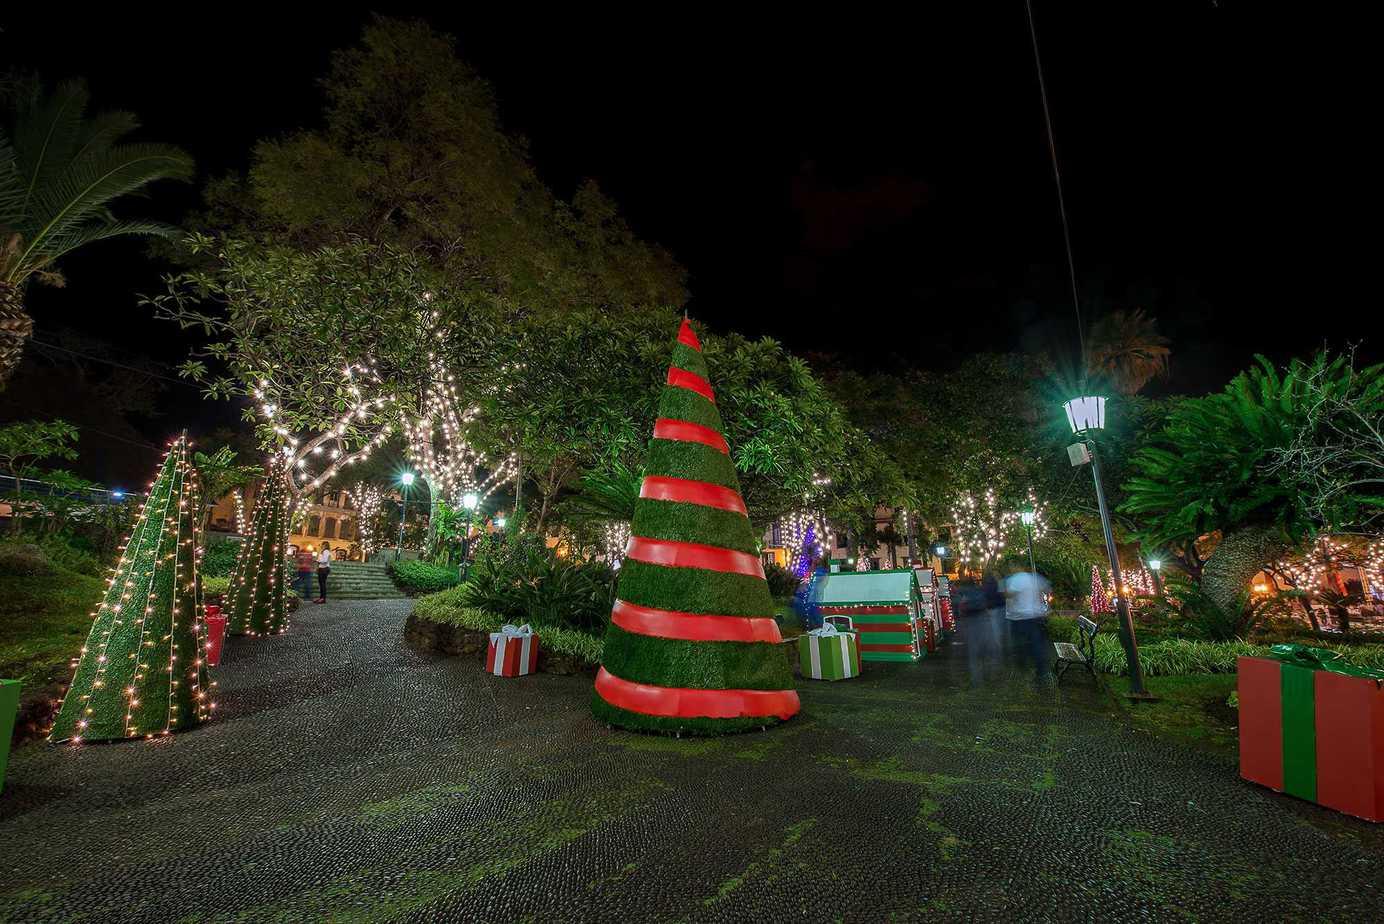 Christmas Decorations & children's train Praca Do Municipio Funchal